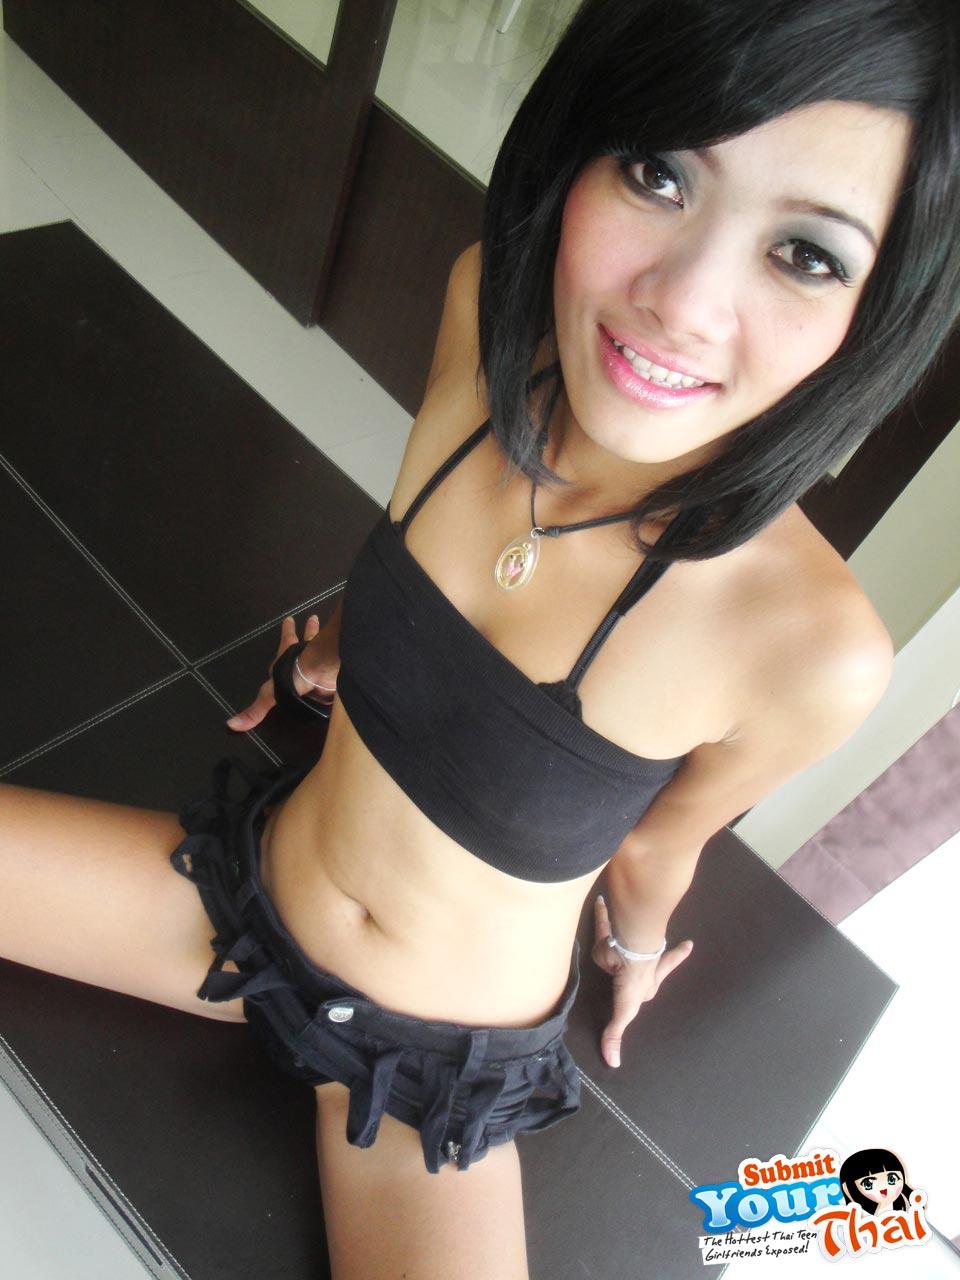 Chinese nude self shot